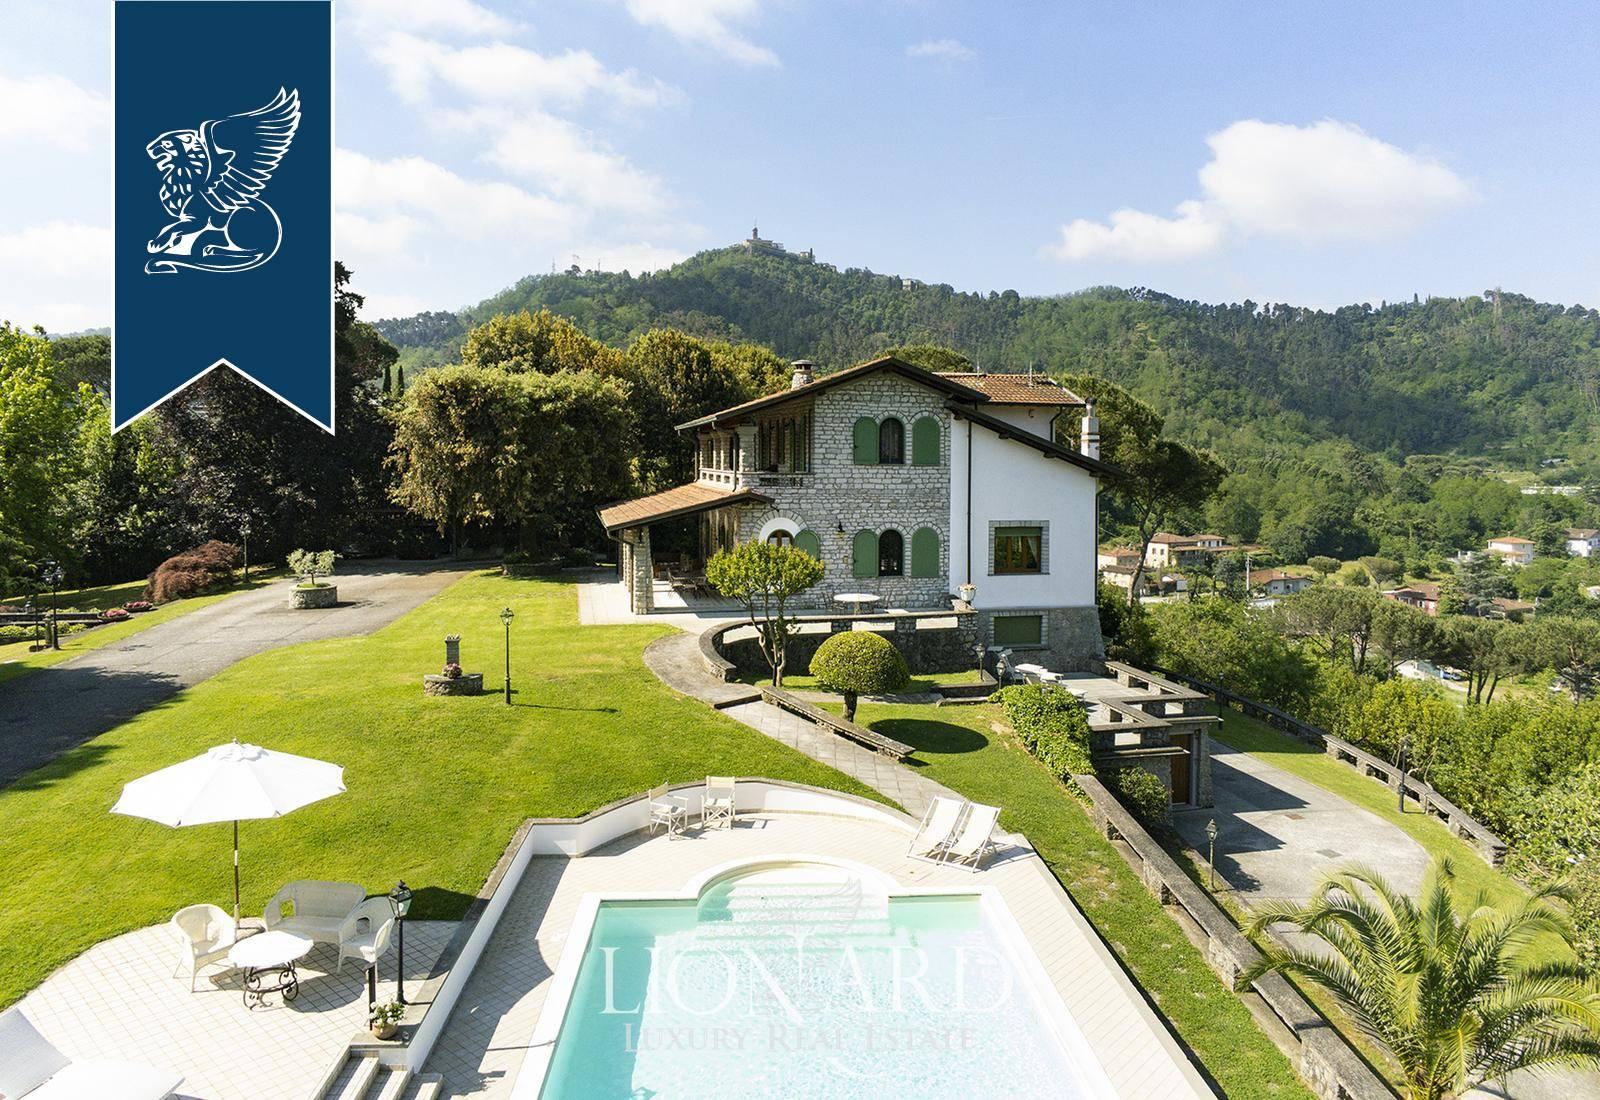 Villa in Vendita a Camaiore: 0 locali, 400 mq - Foto 2